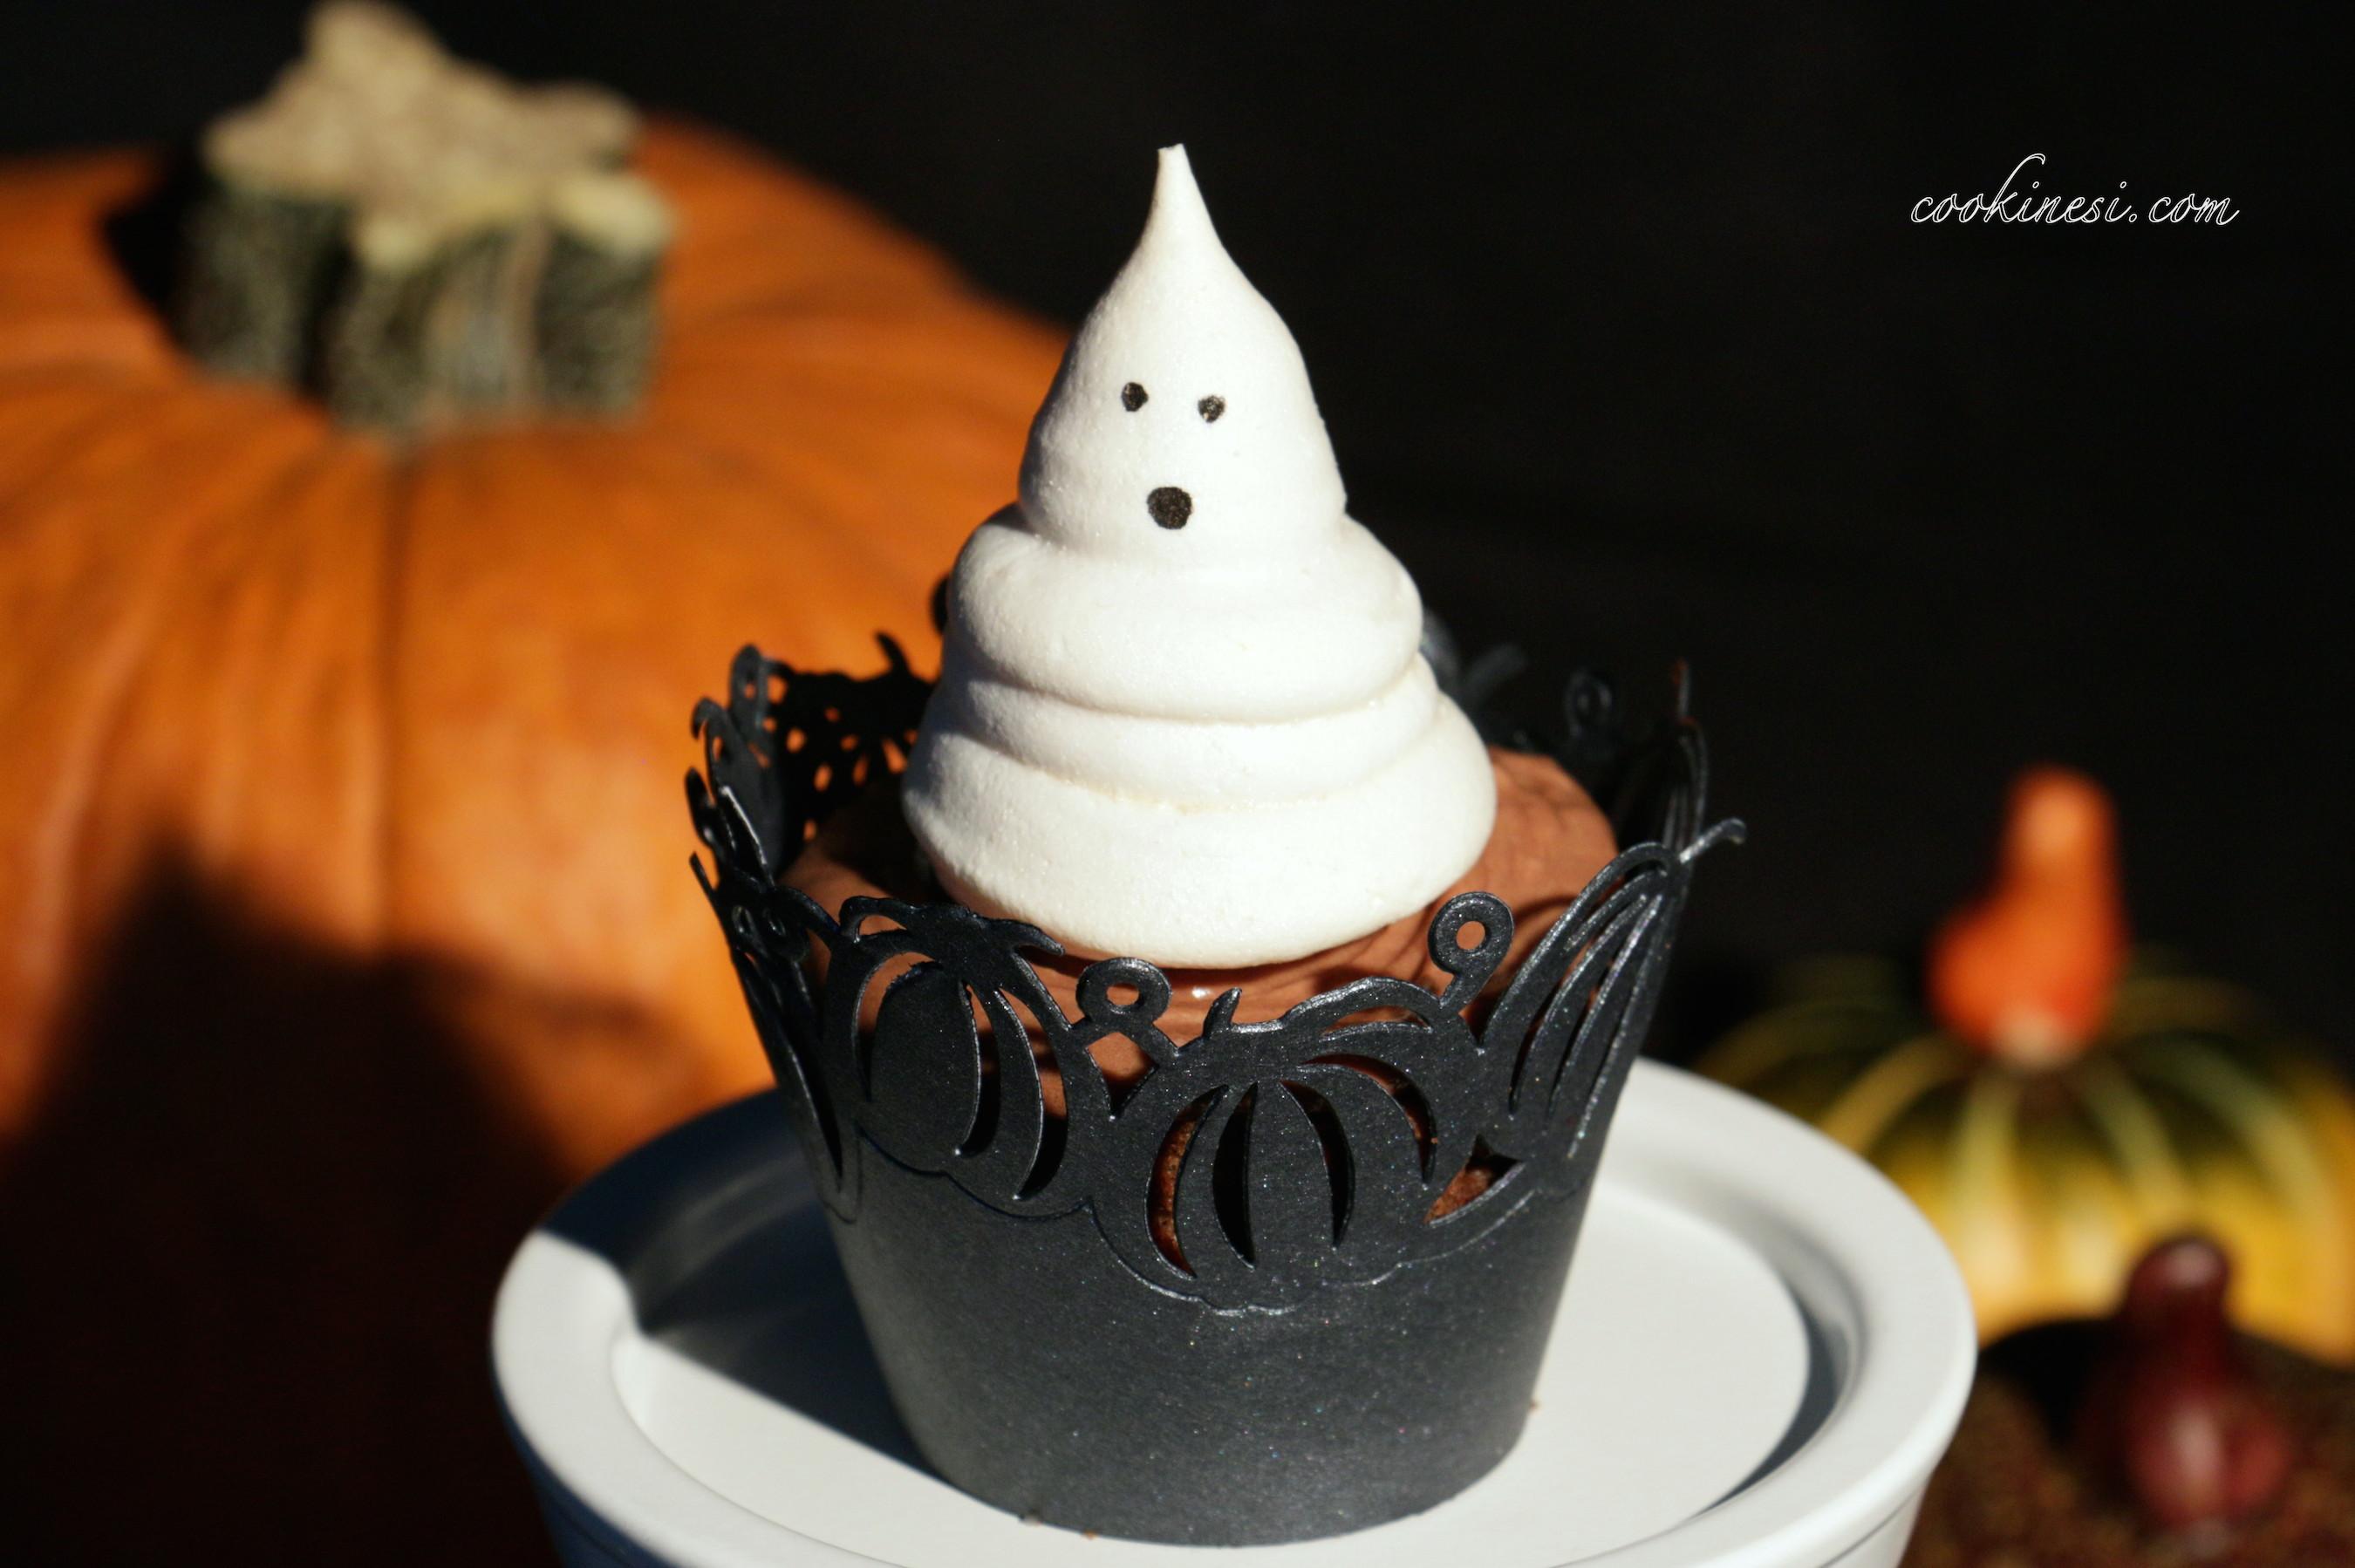 cookinesi blutende cupcakes mit baiser geist. Black Bedroom Furniture Sets. Home Design Ideas